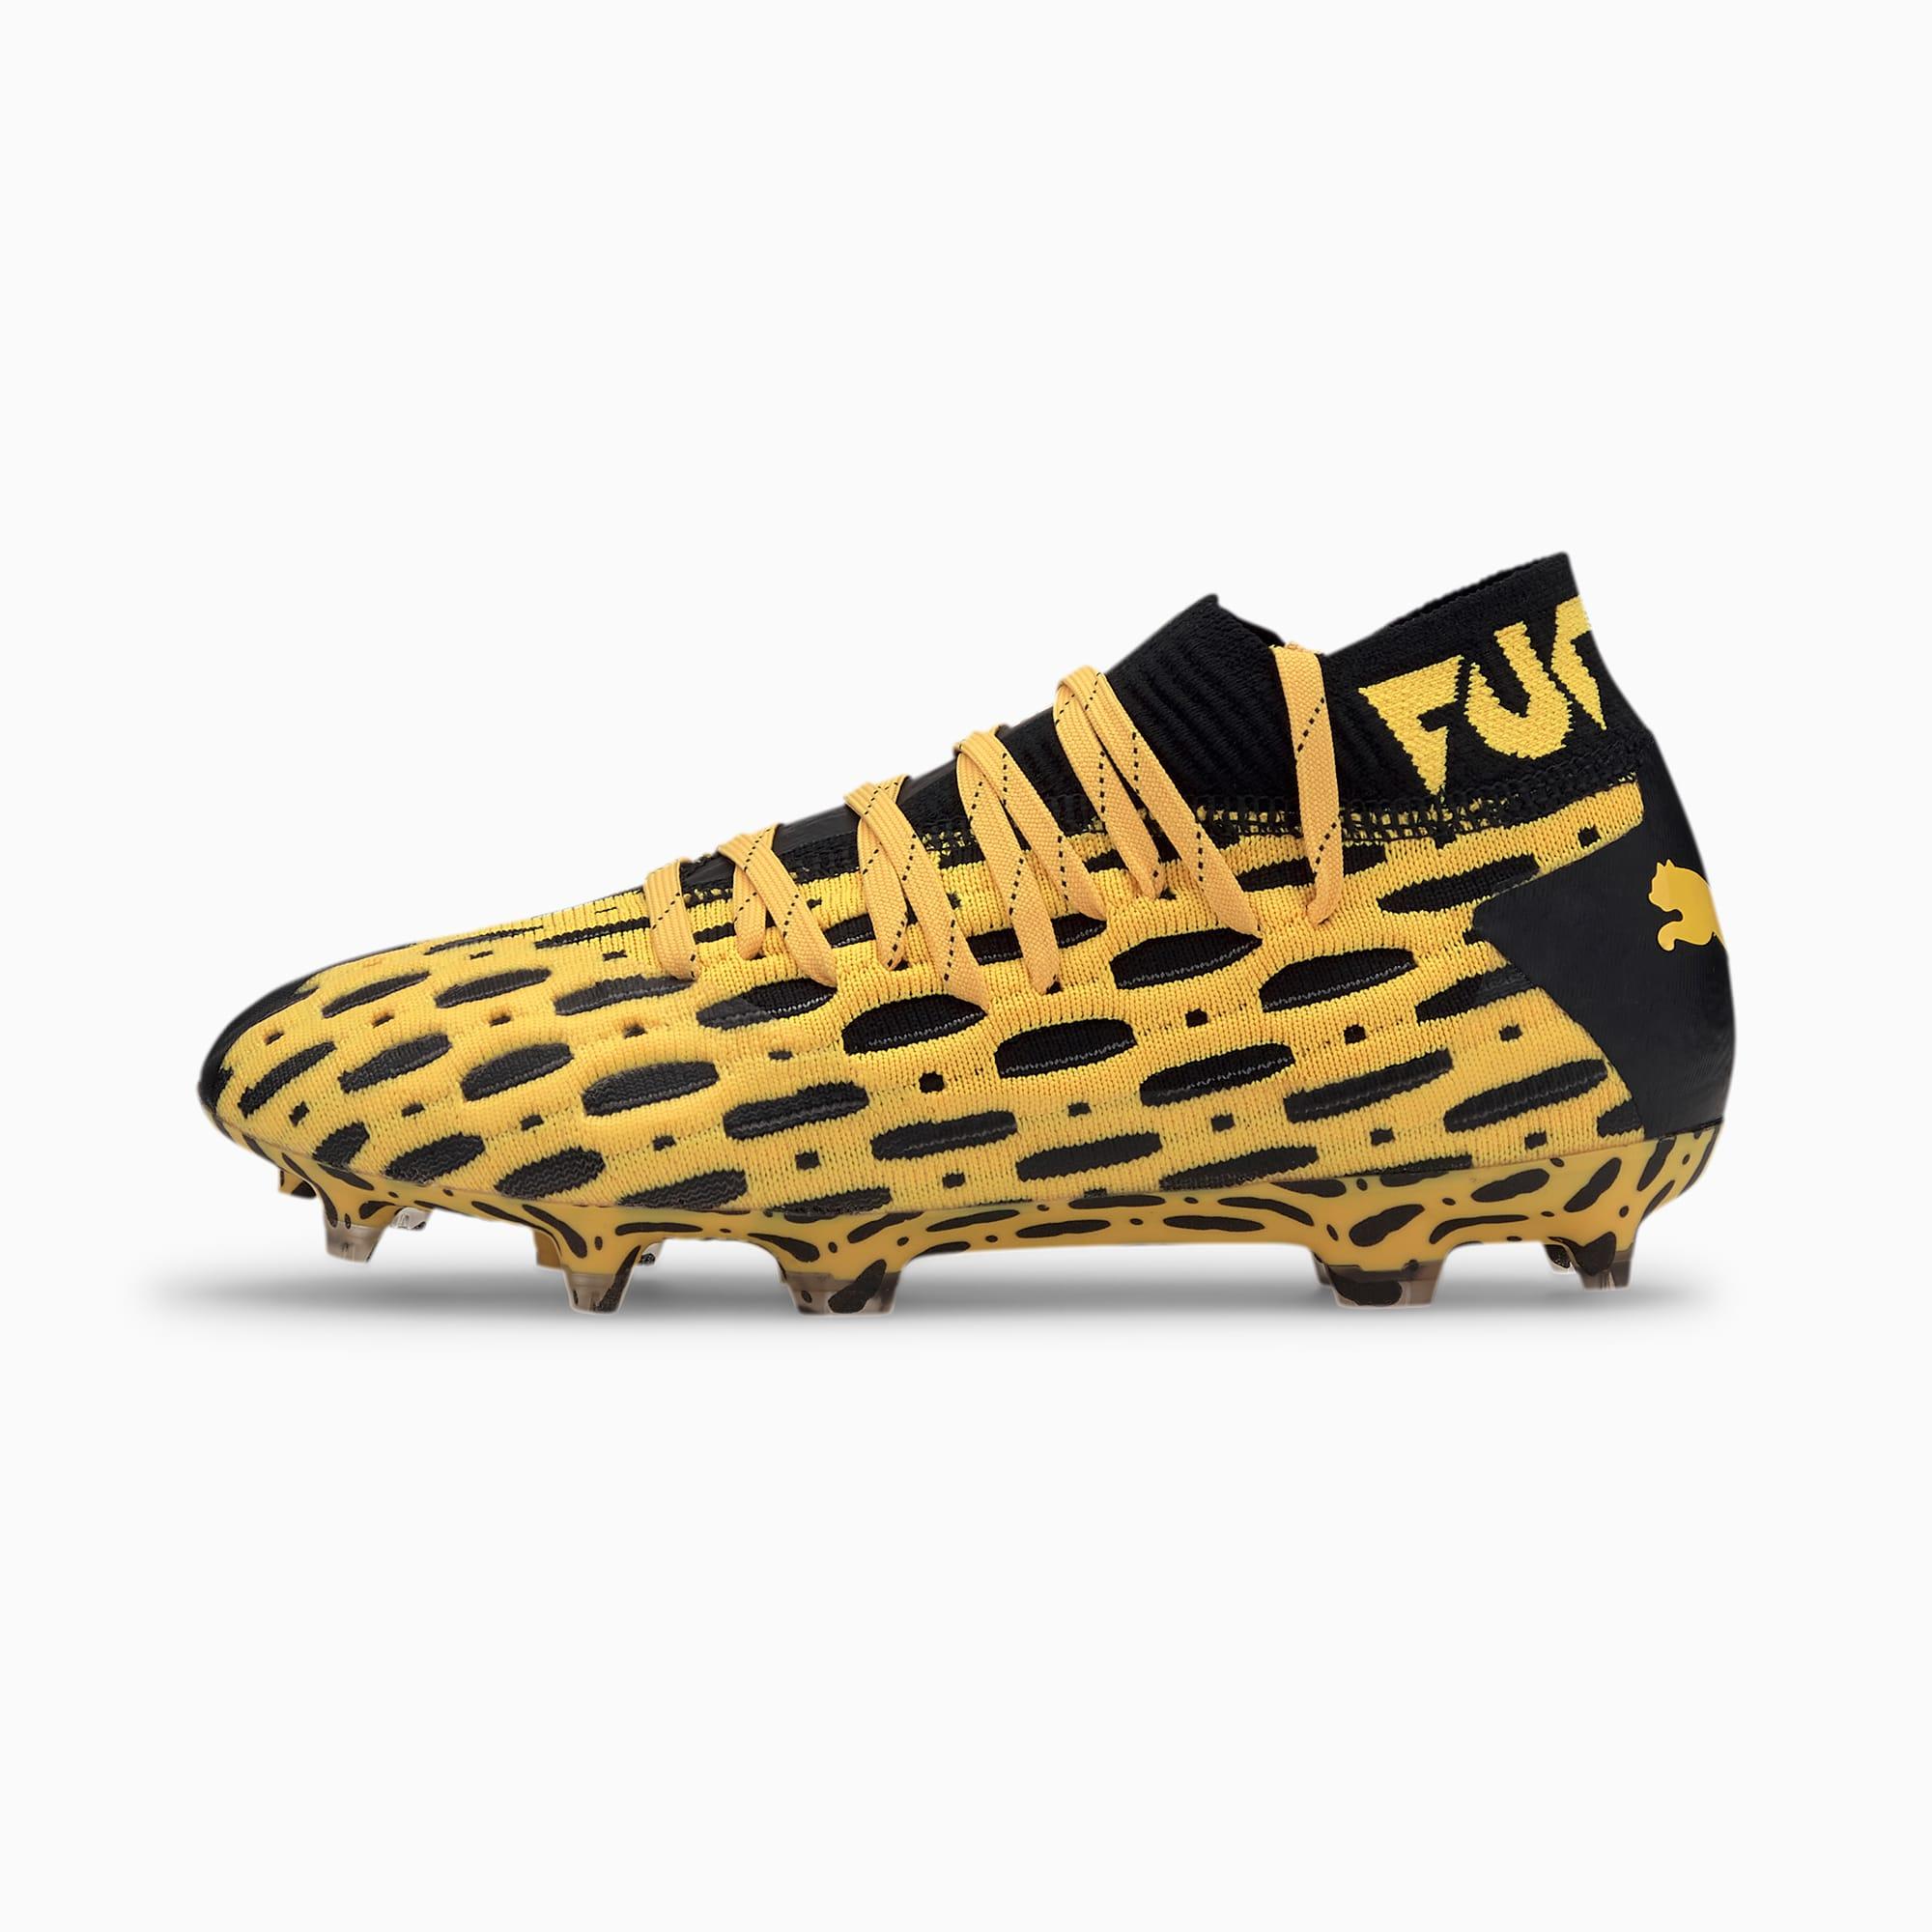 5.1 NETFIT FG/AG Youth Football Boots